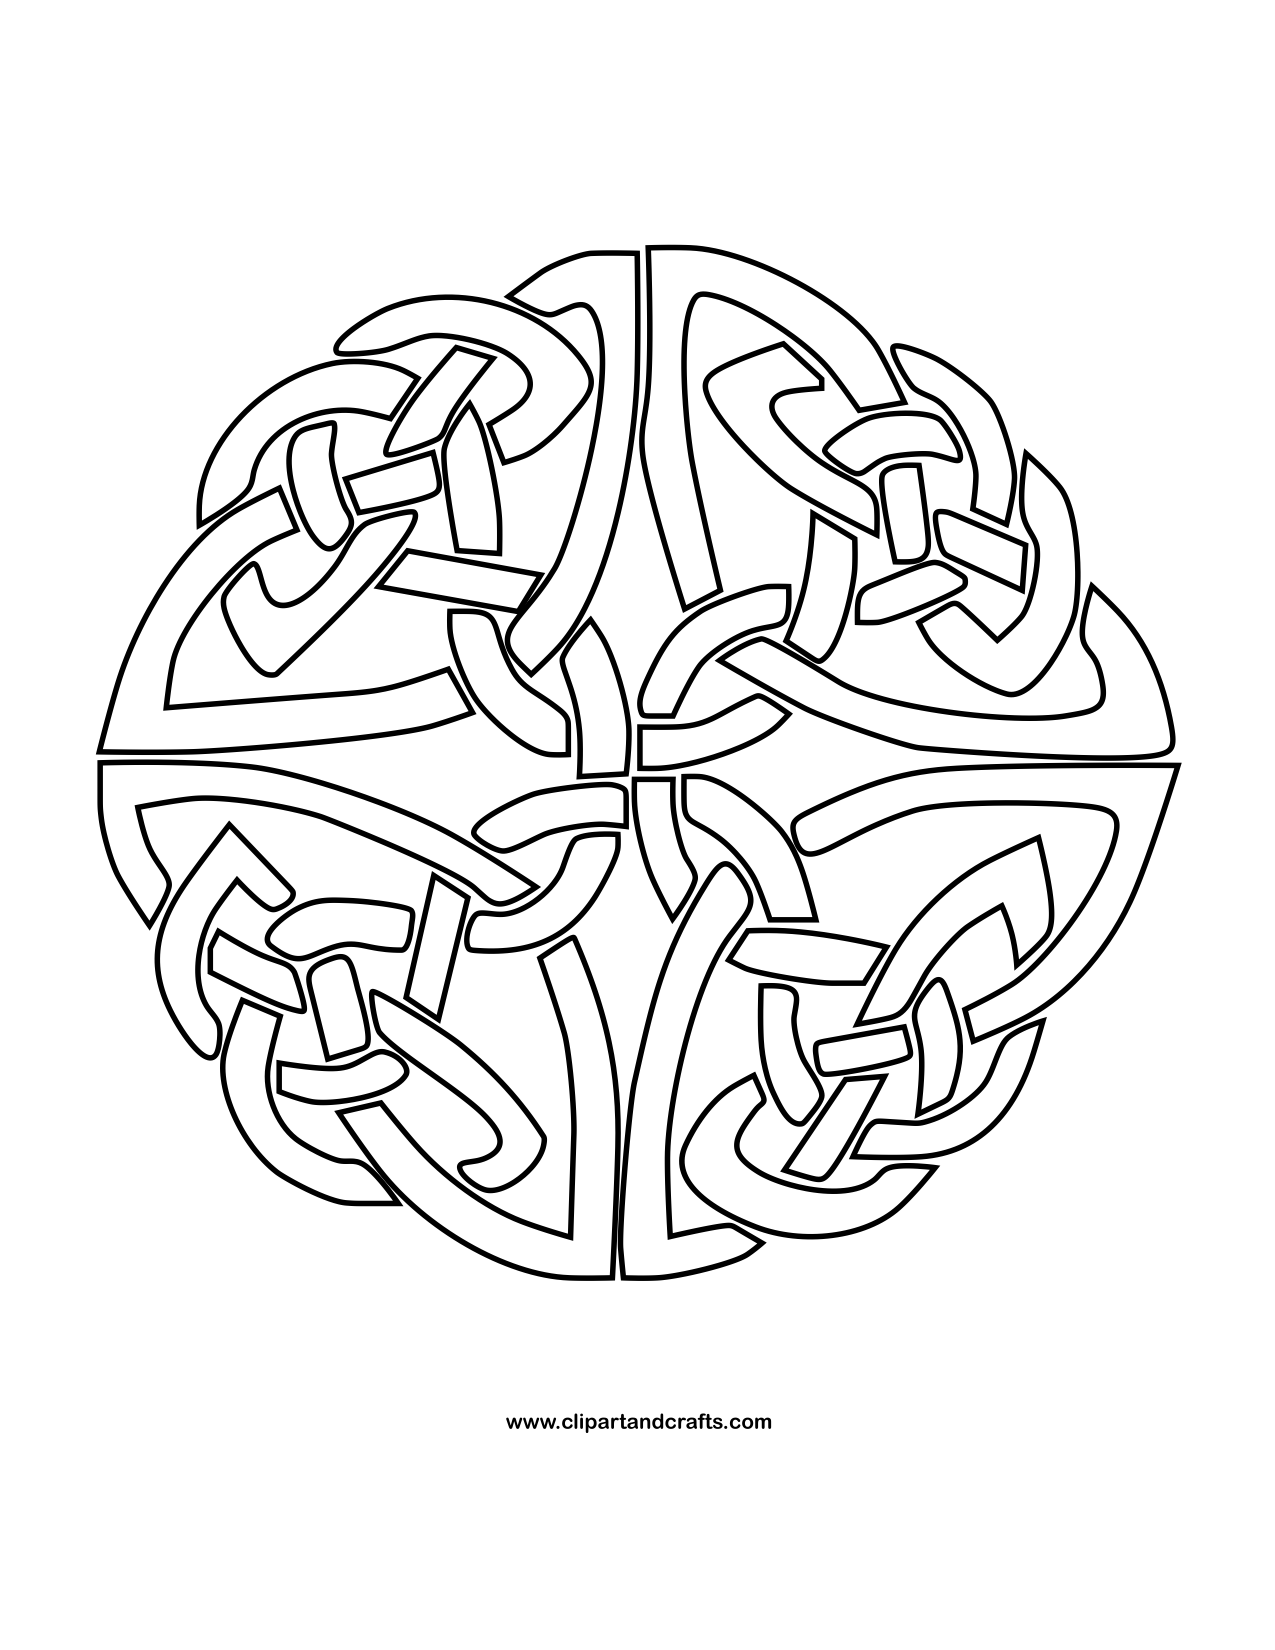 Mandala Monday More Free Celtic Mandalas To Color Celtic Coloring Celtic Coloring Book Celtic Patterns